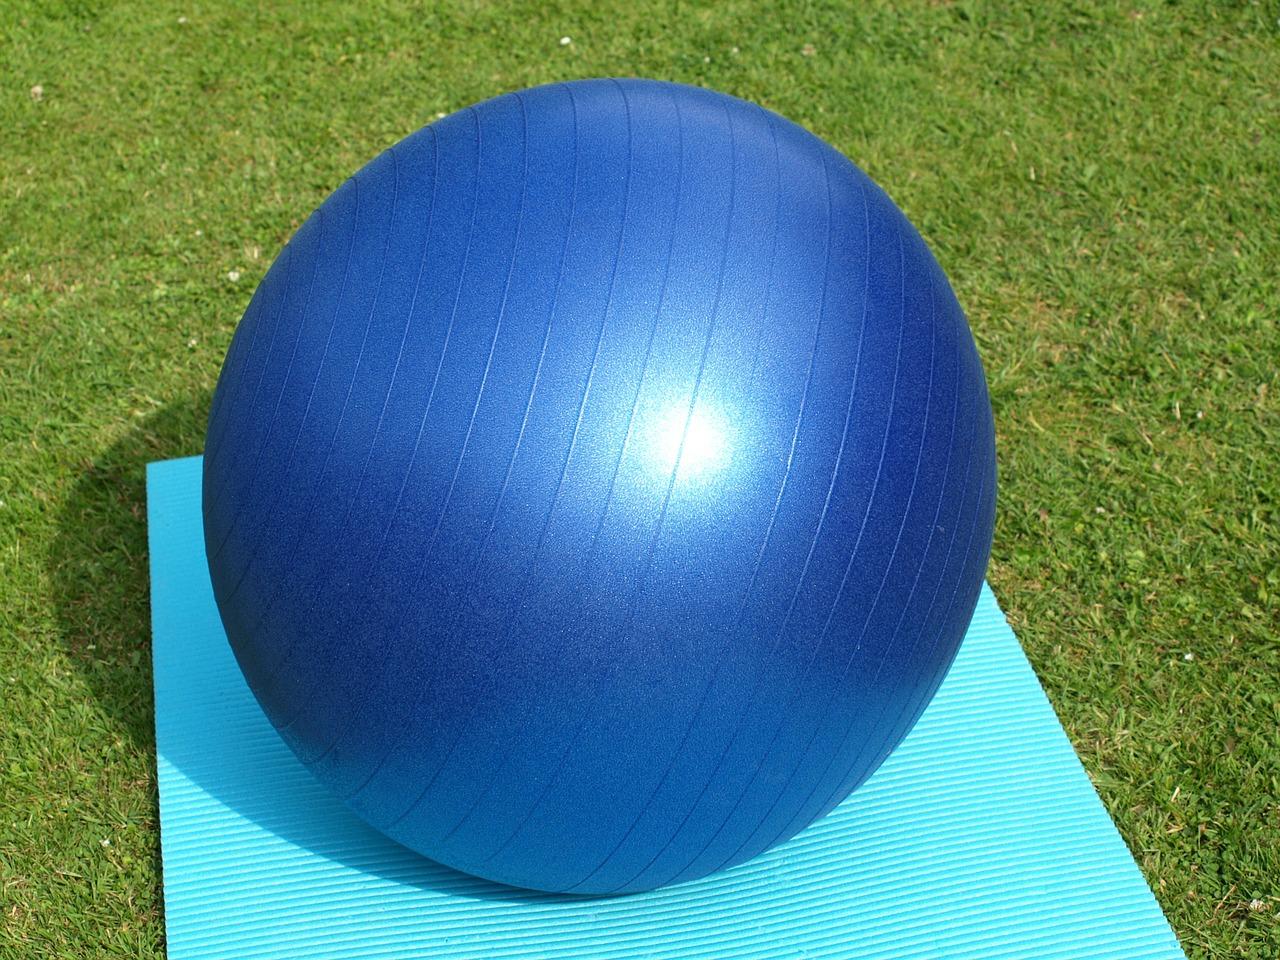 exercise-ball-374948_1280